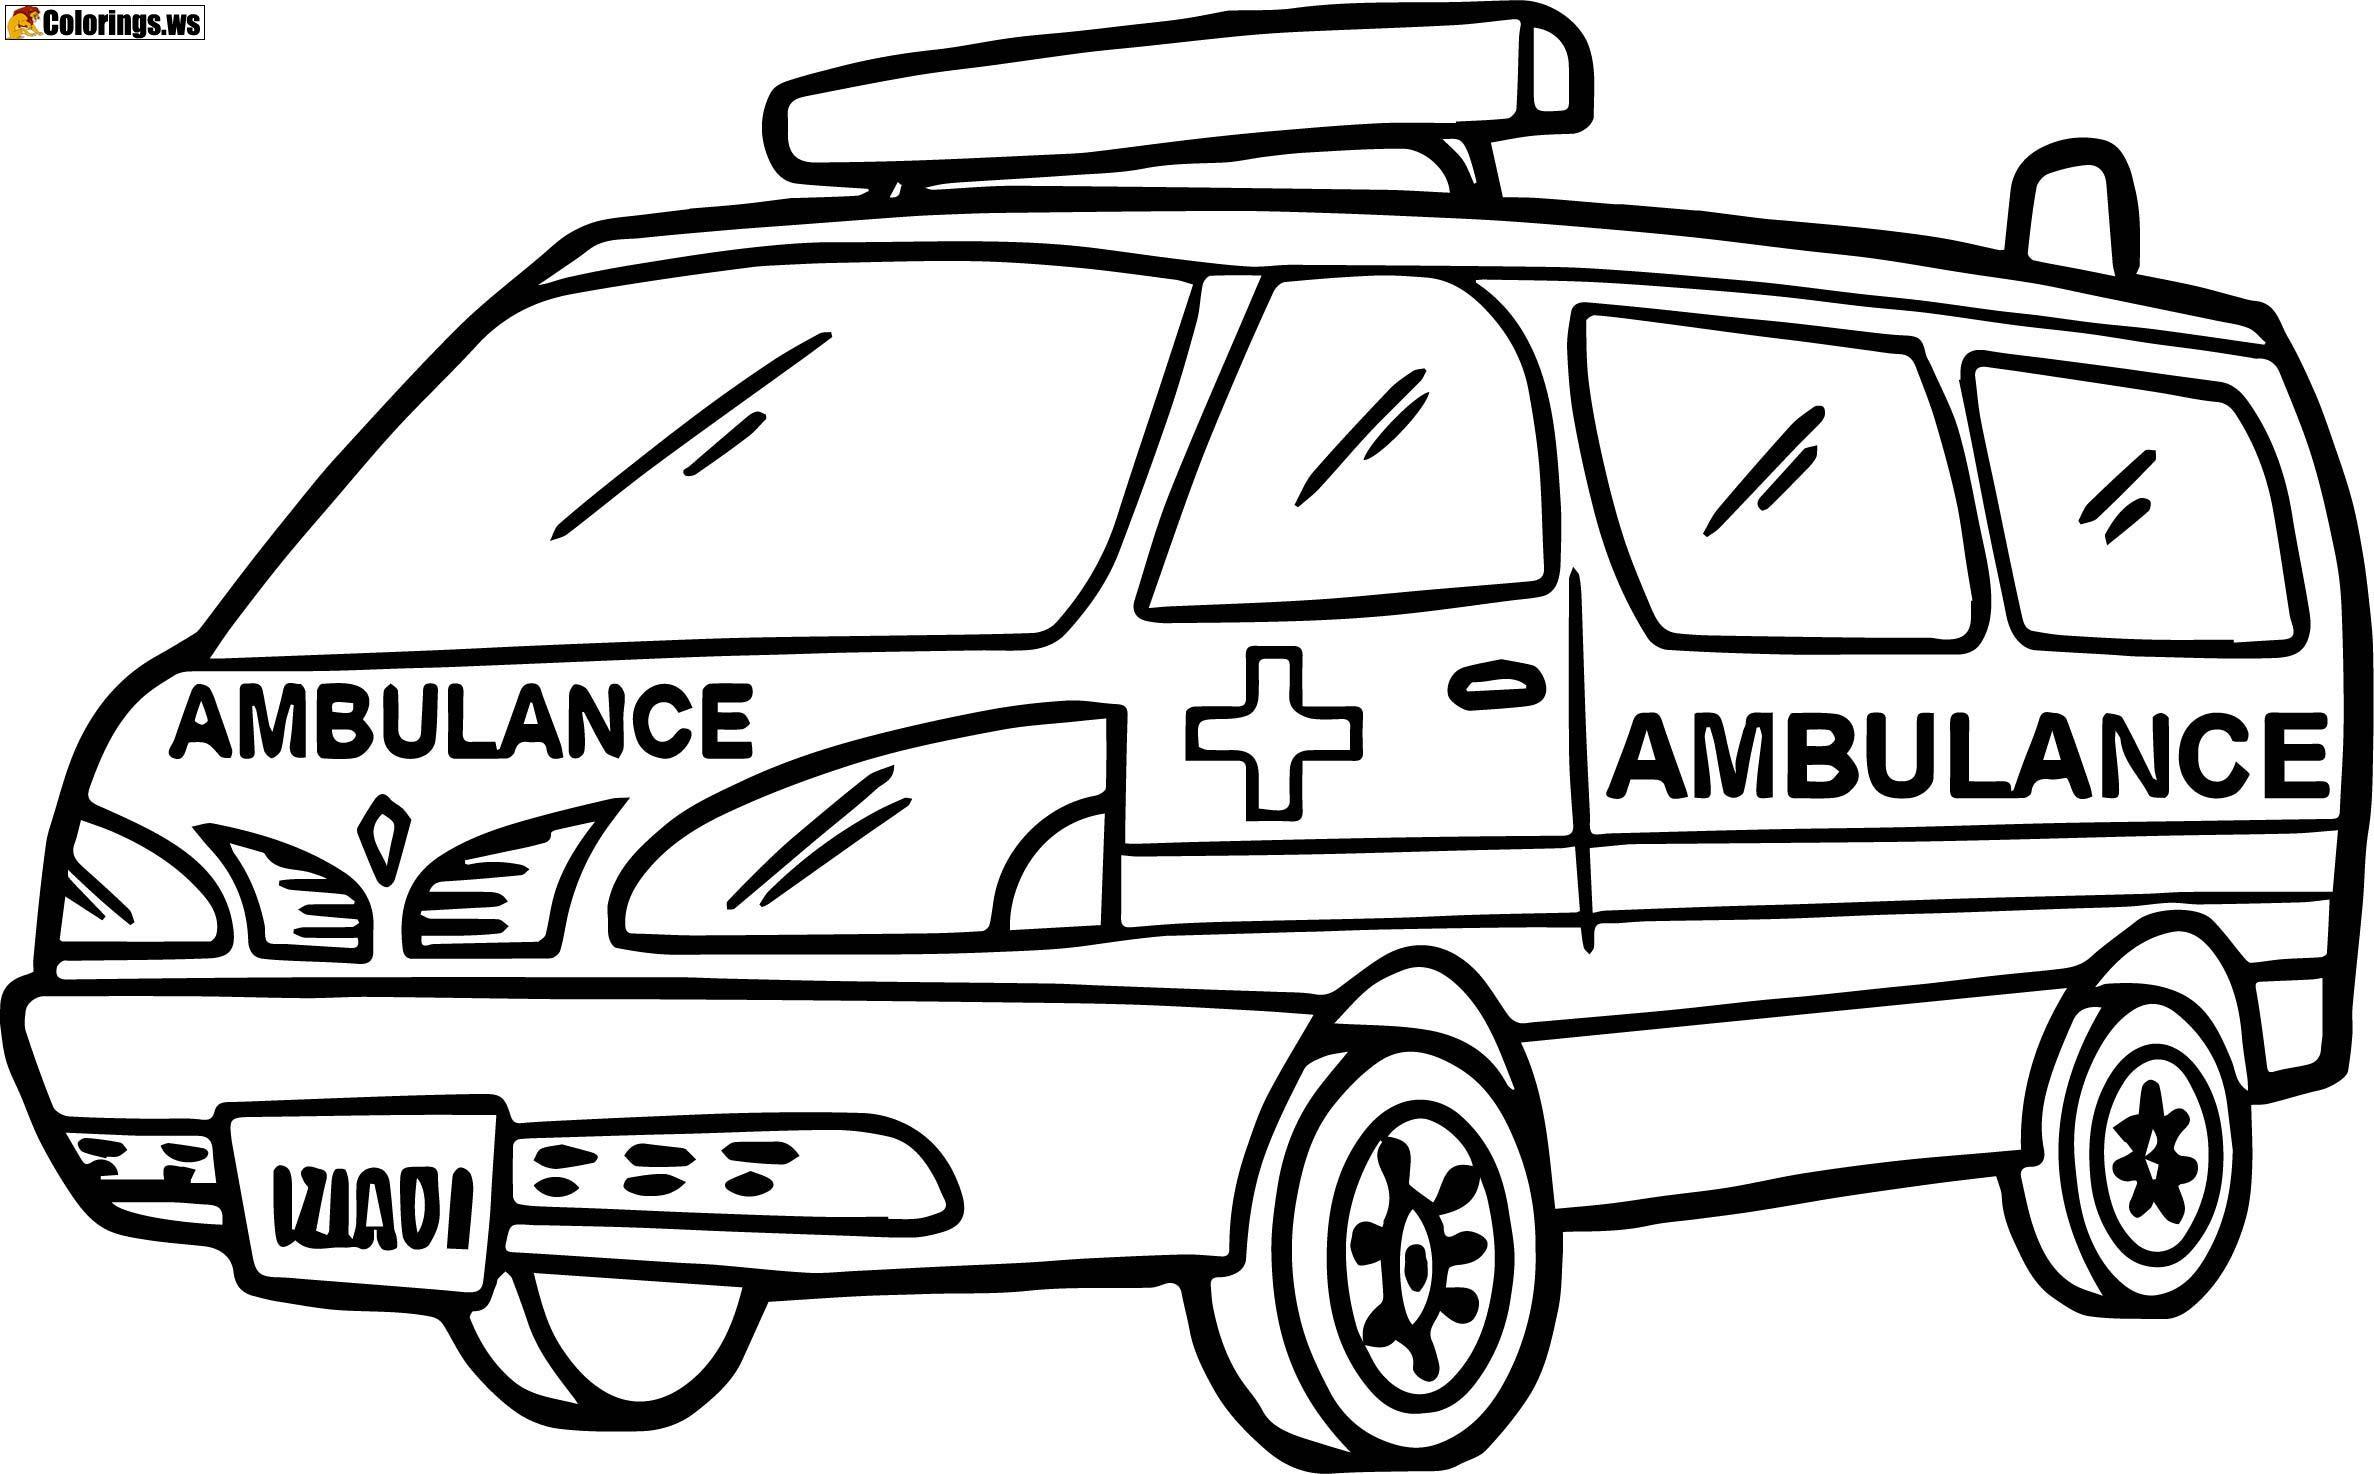 Ambulance Car Coloring Pages